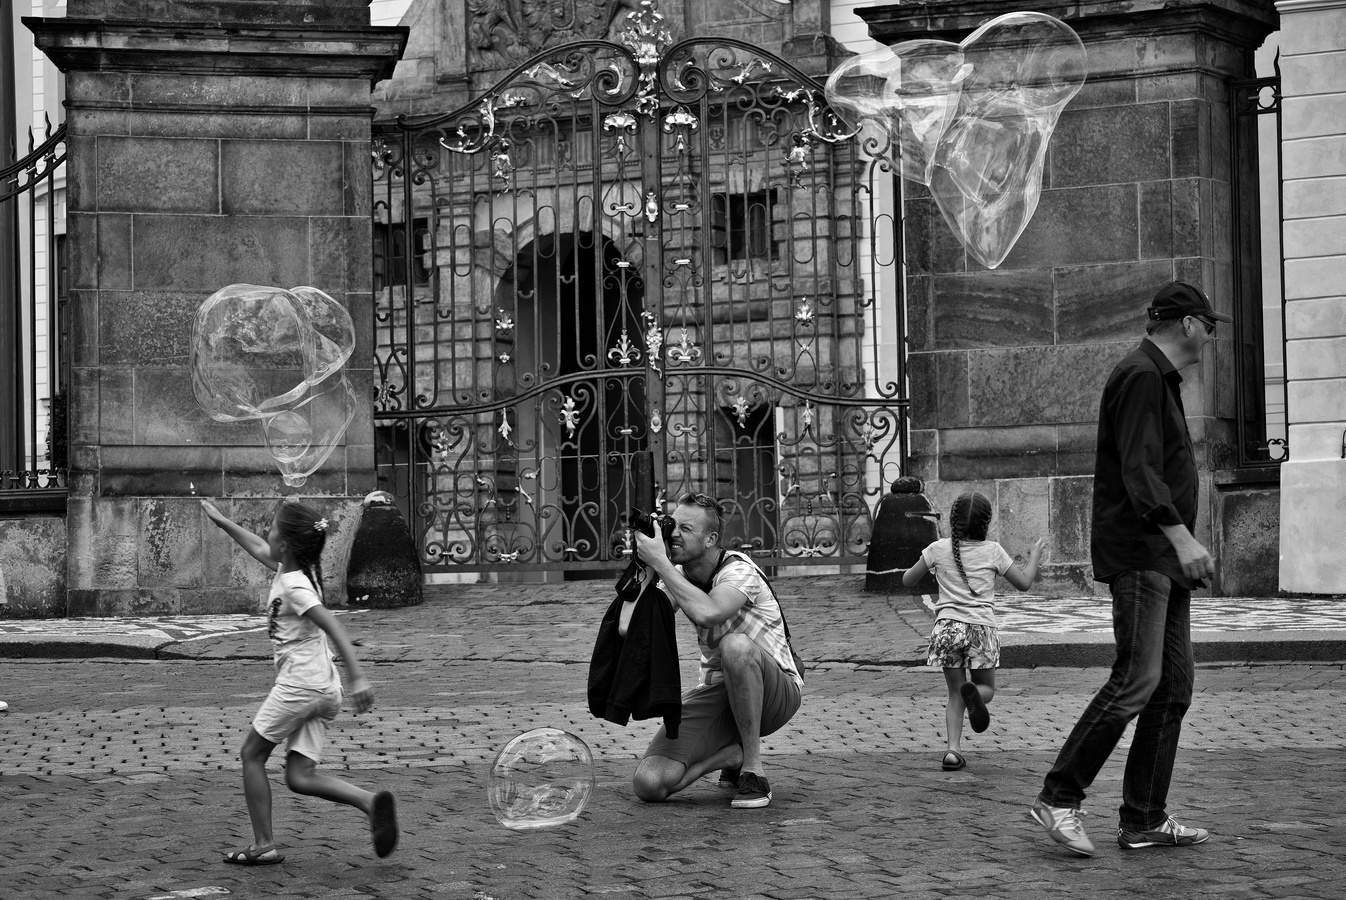 Hon za bublinami